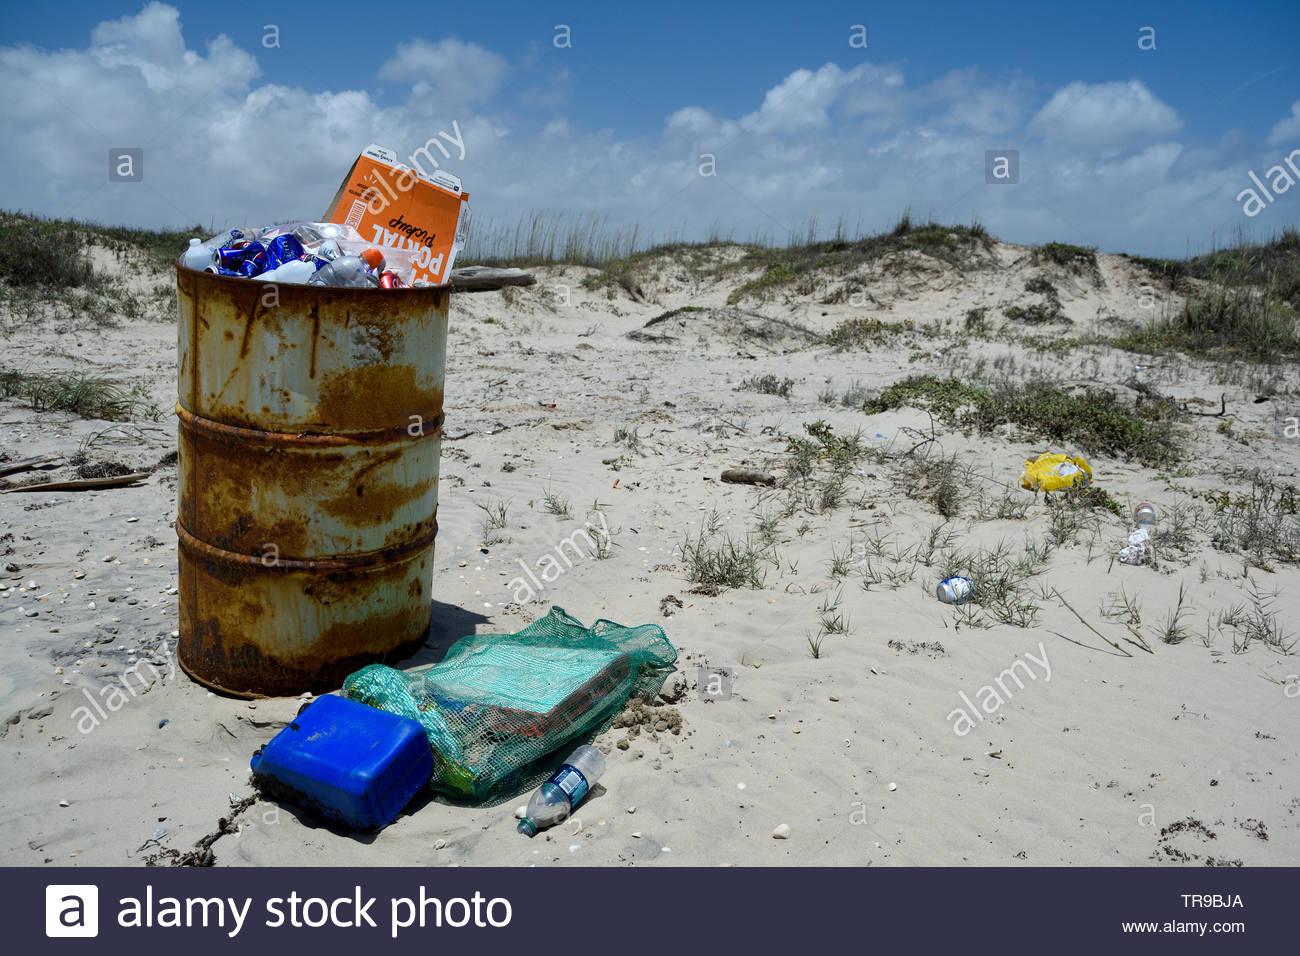 Trash on beach. Overflowing trash can on beach. Trash Barrel overflowing. Garbage Can. Garbage on Texas Beach. Trash left on beach Memorial Day. Trash - Stock Image